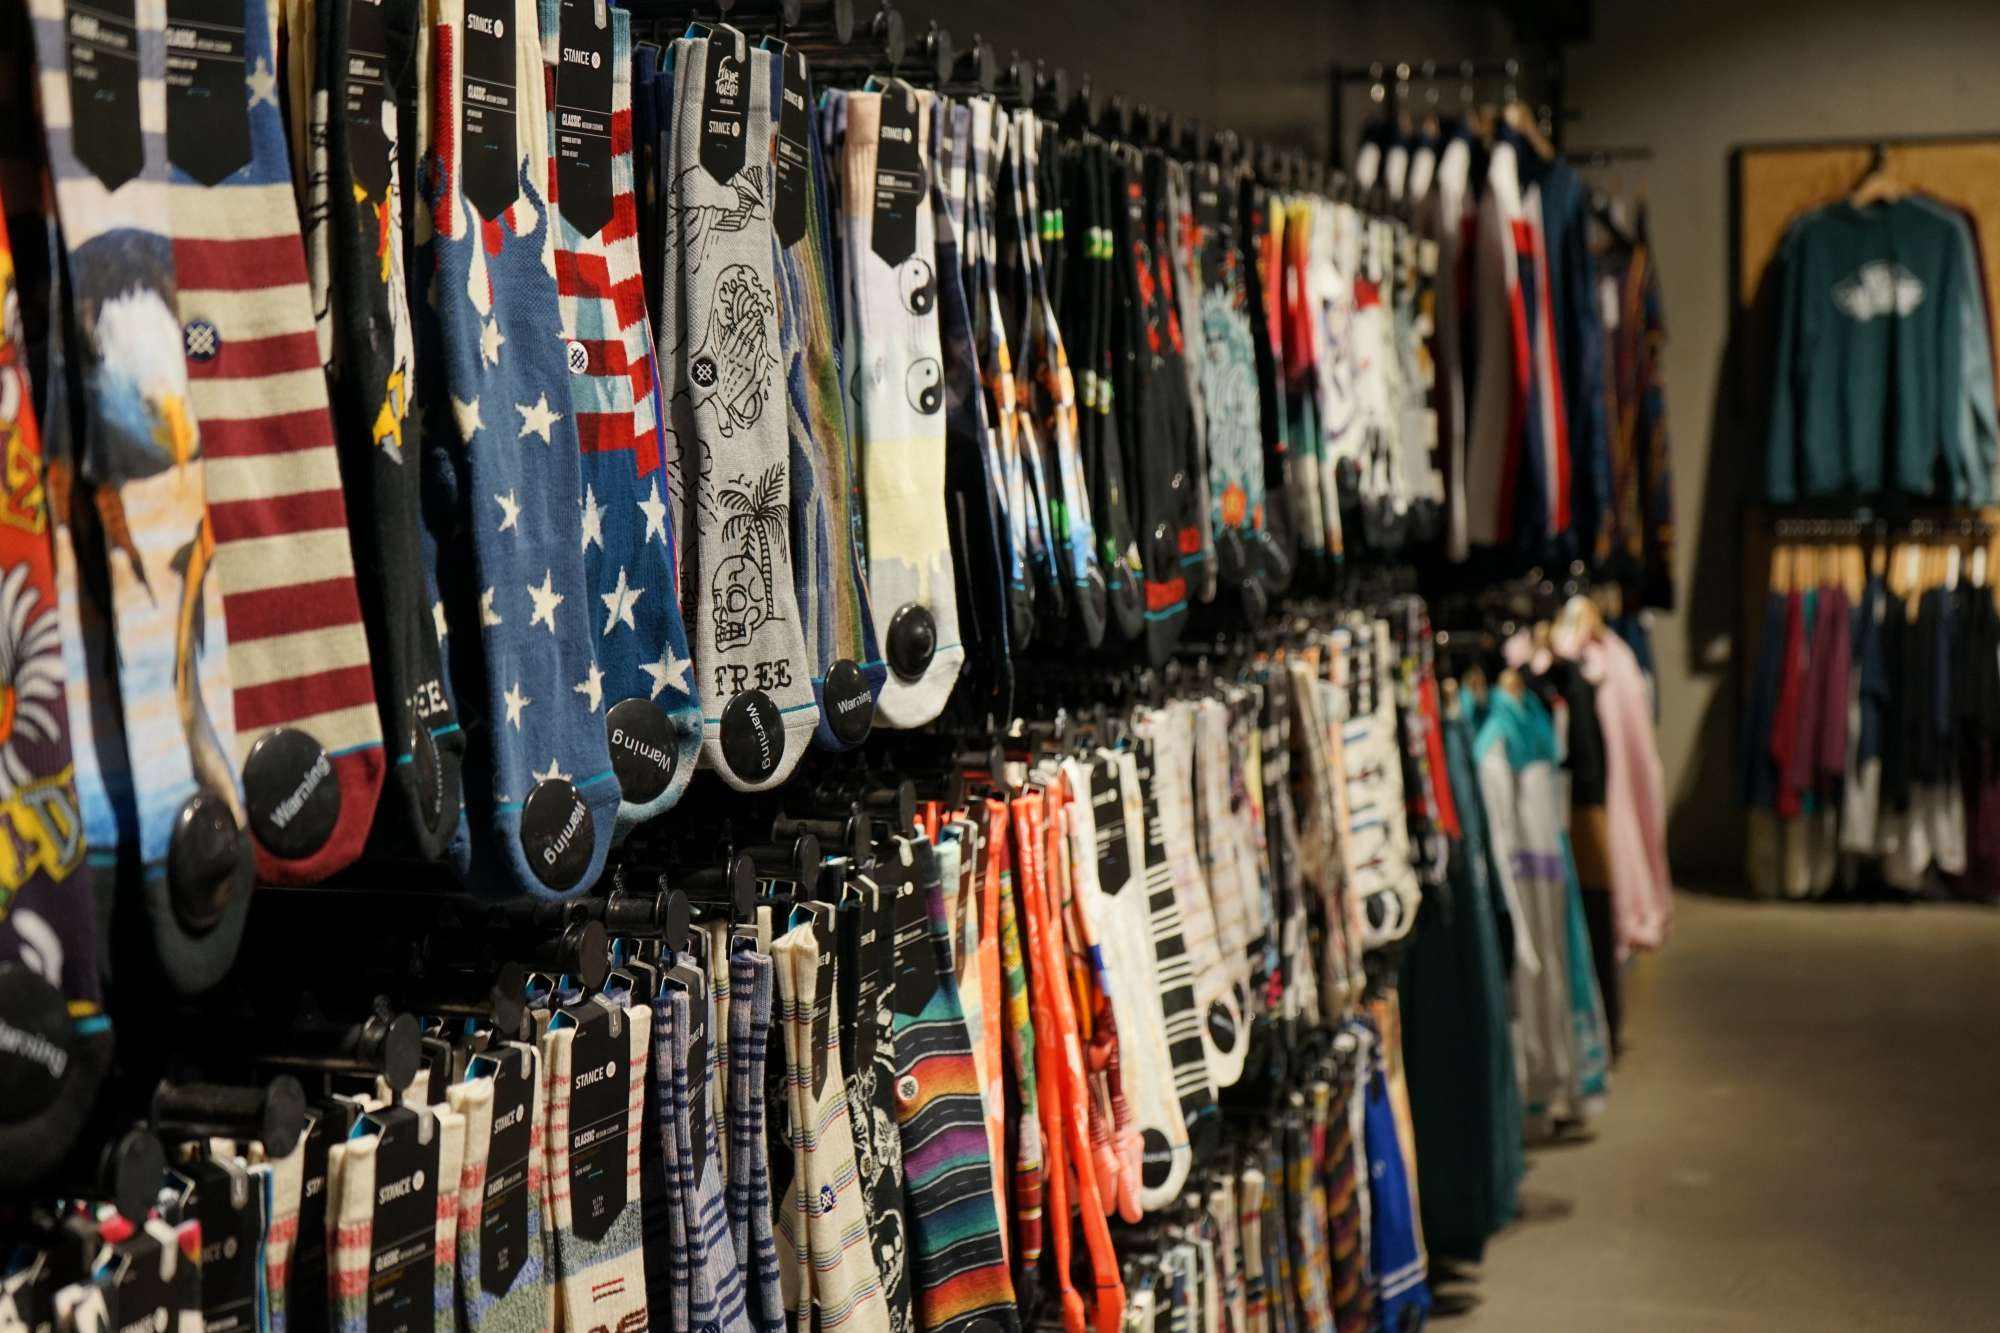 A wall of socks